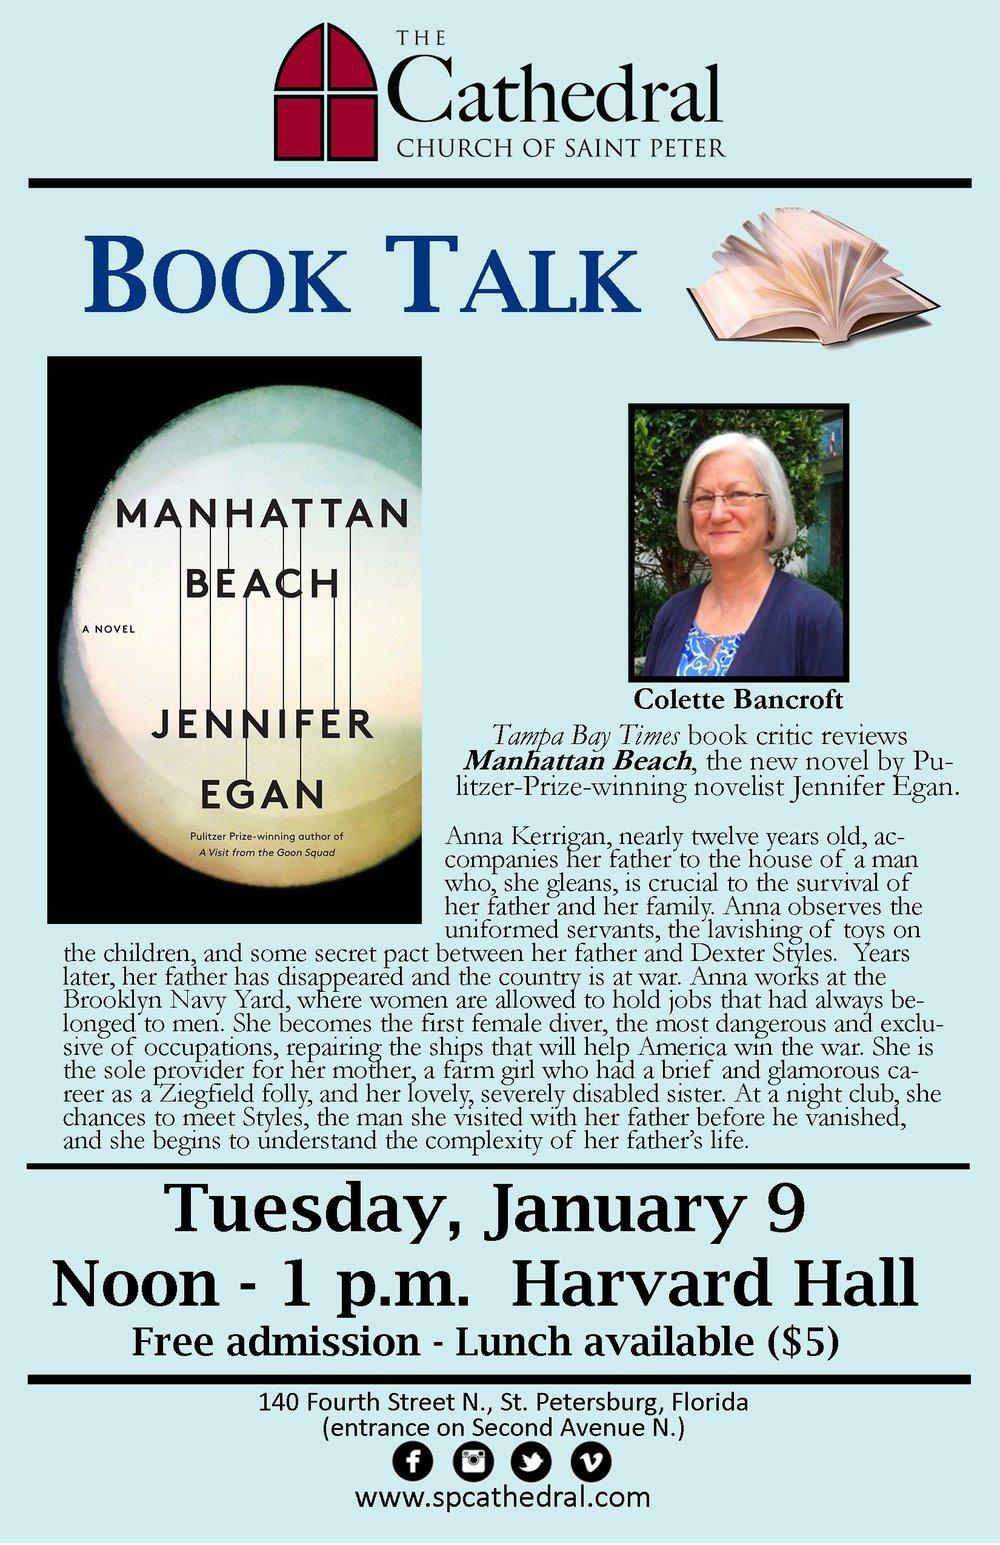 2018-01-9 Book Talk Colette Bancroft.jpg